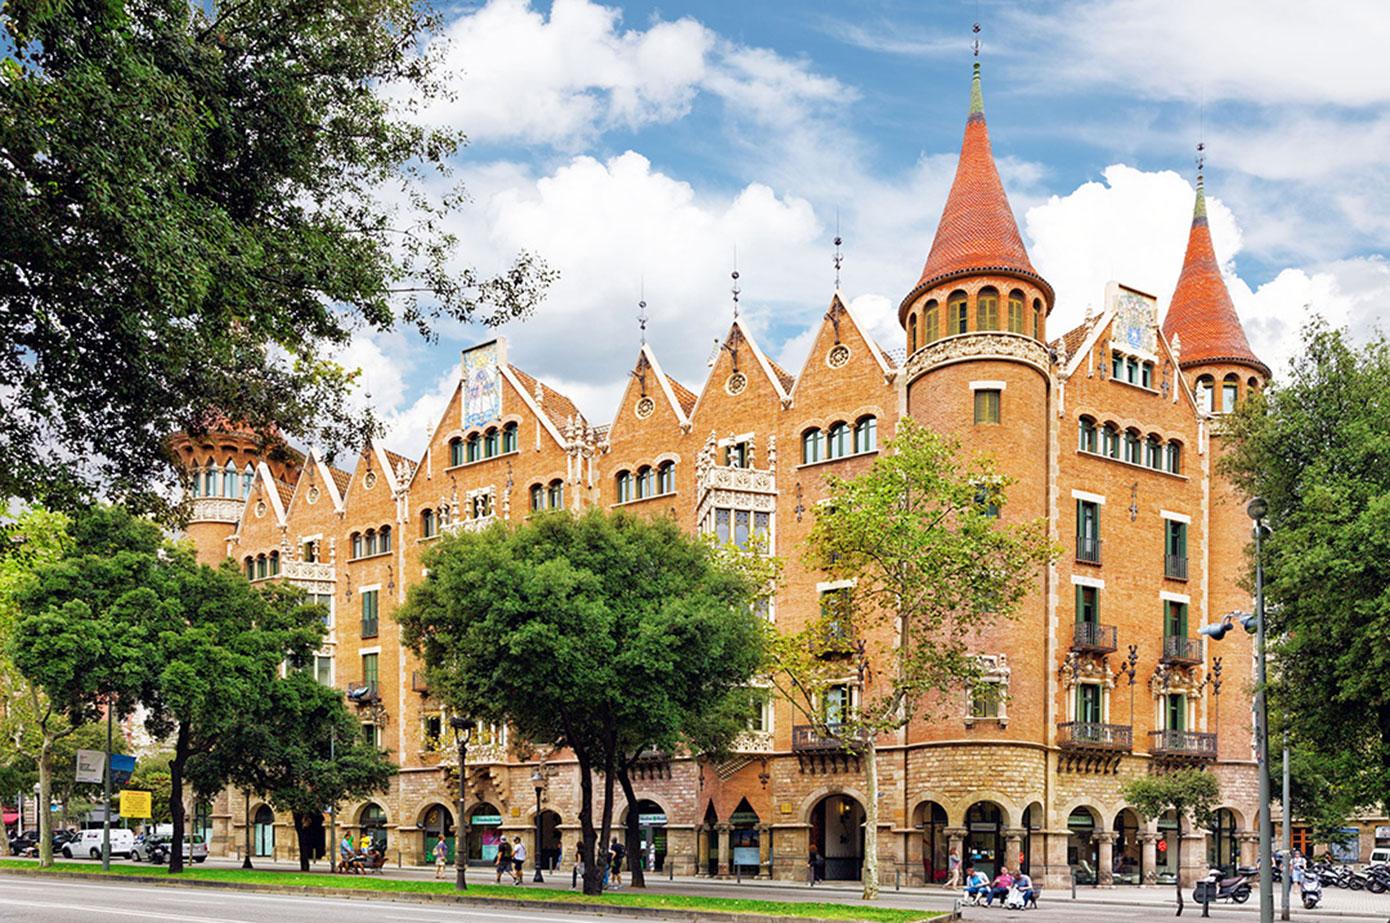 Casa terradas casa de les punxes knowing barcelona - Casa de las punxes ...